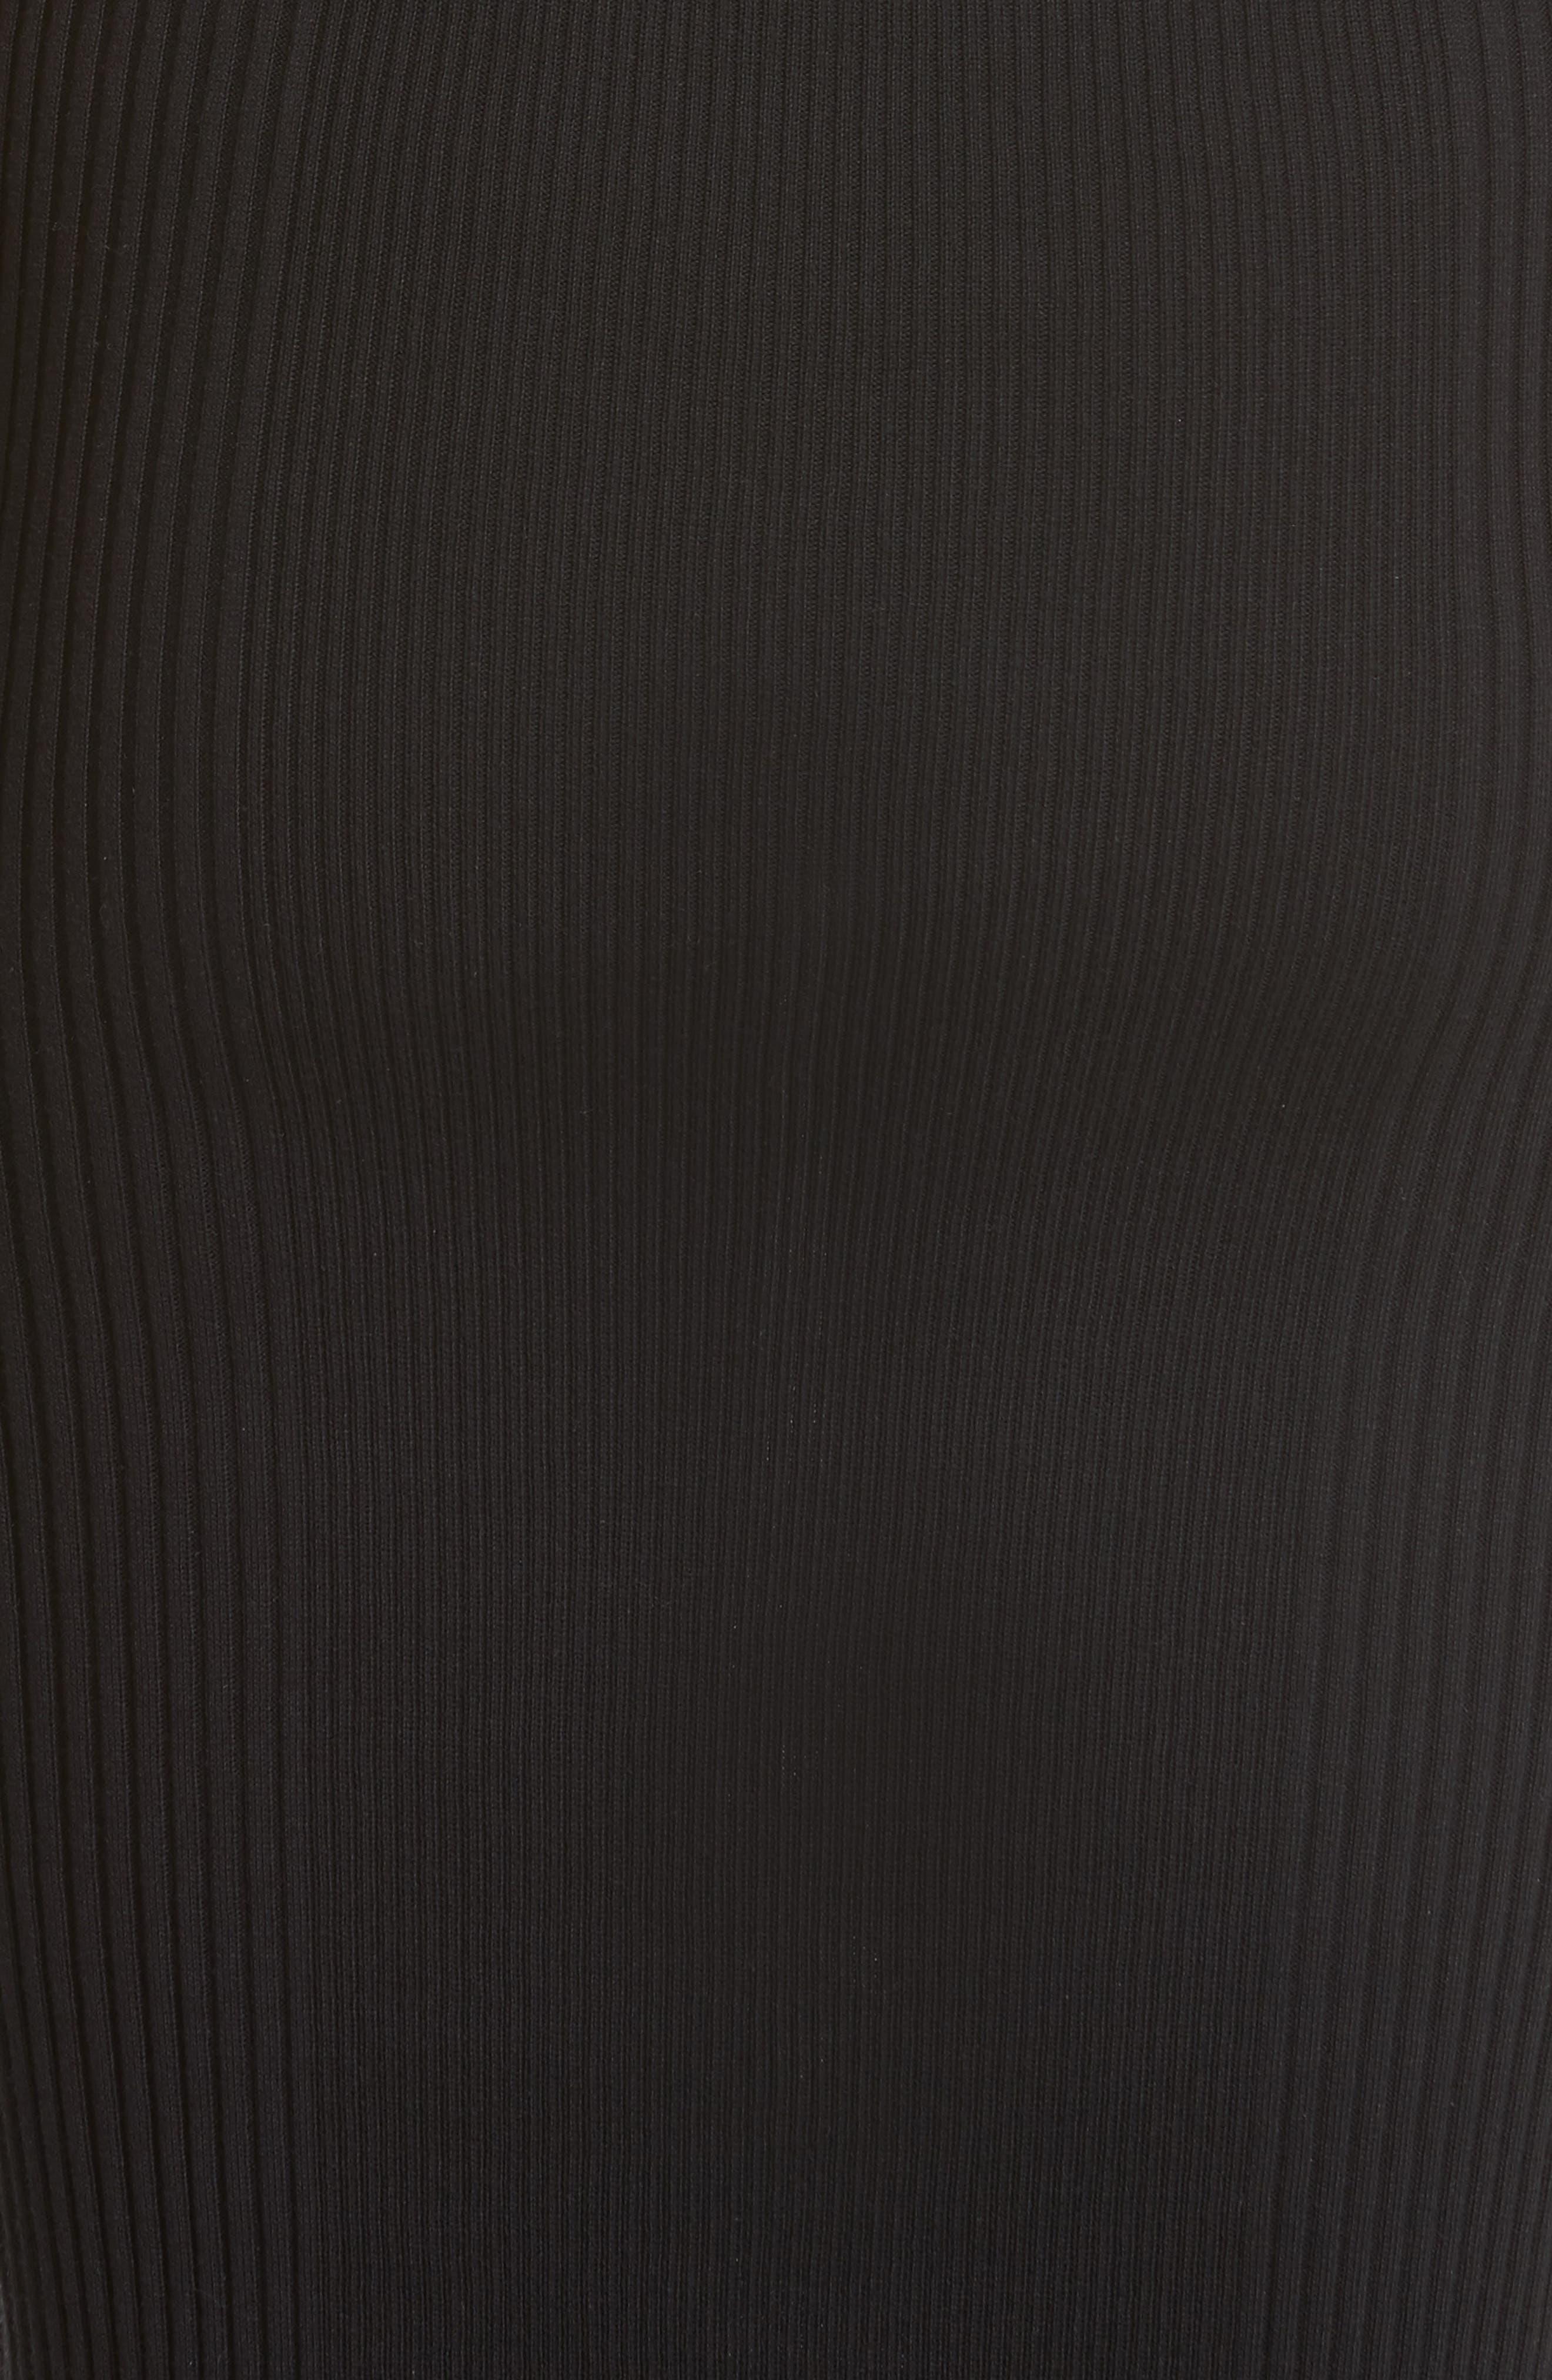 Knit Cold Shoulder Dress,                             Alternate thumbnail 5, color,                             001